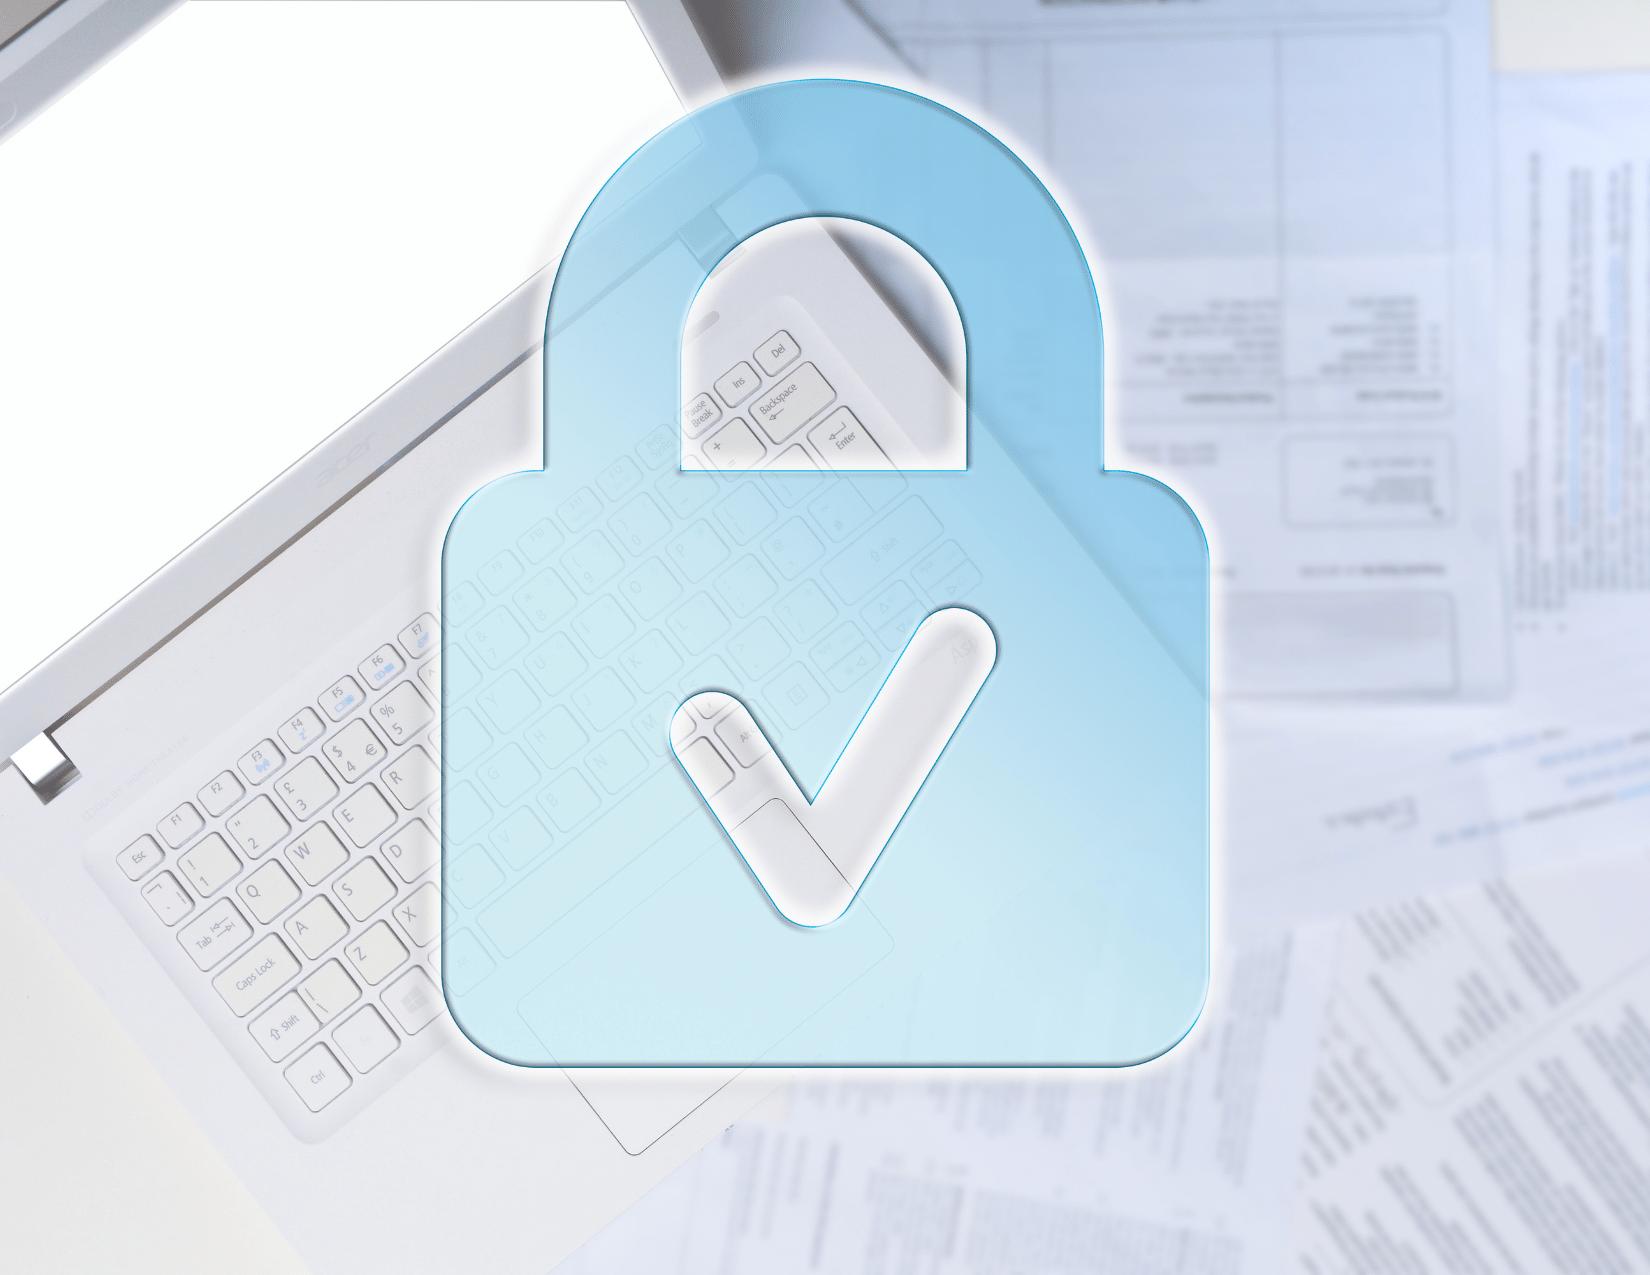 EU-U.S. Privacy Shield Framework Compliant